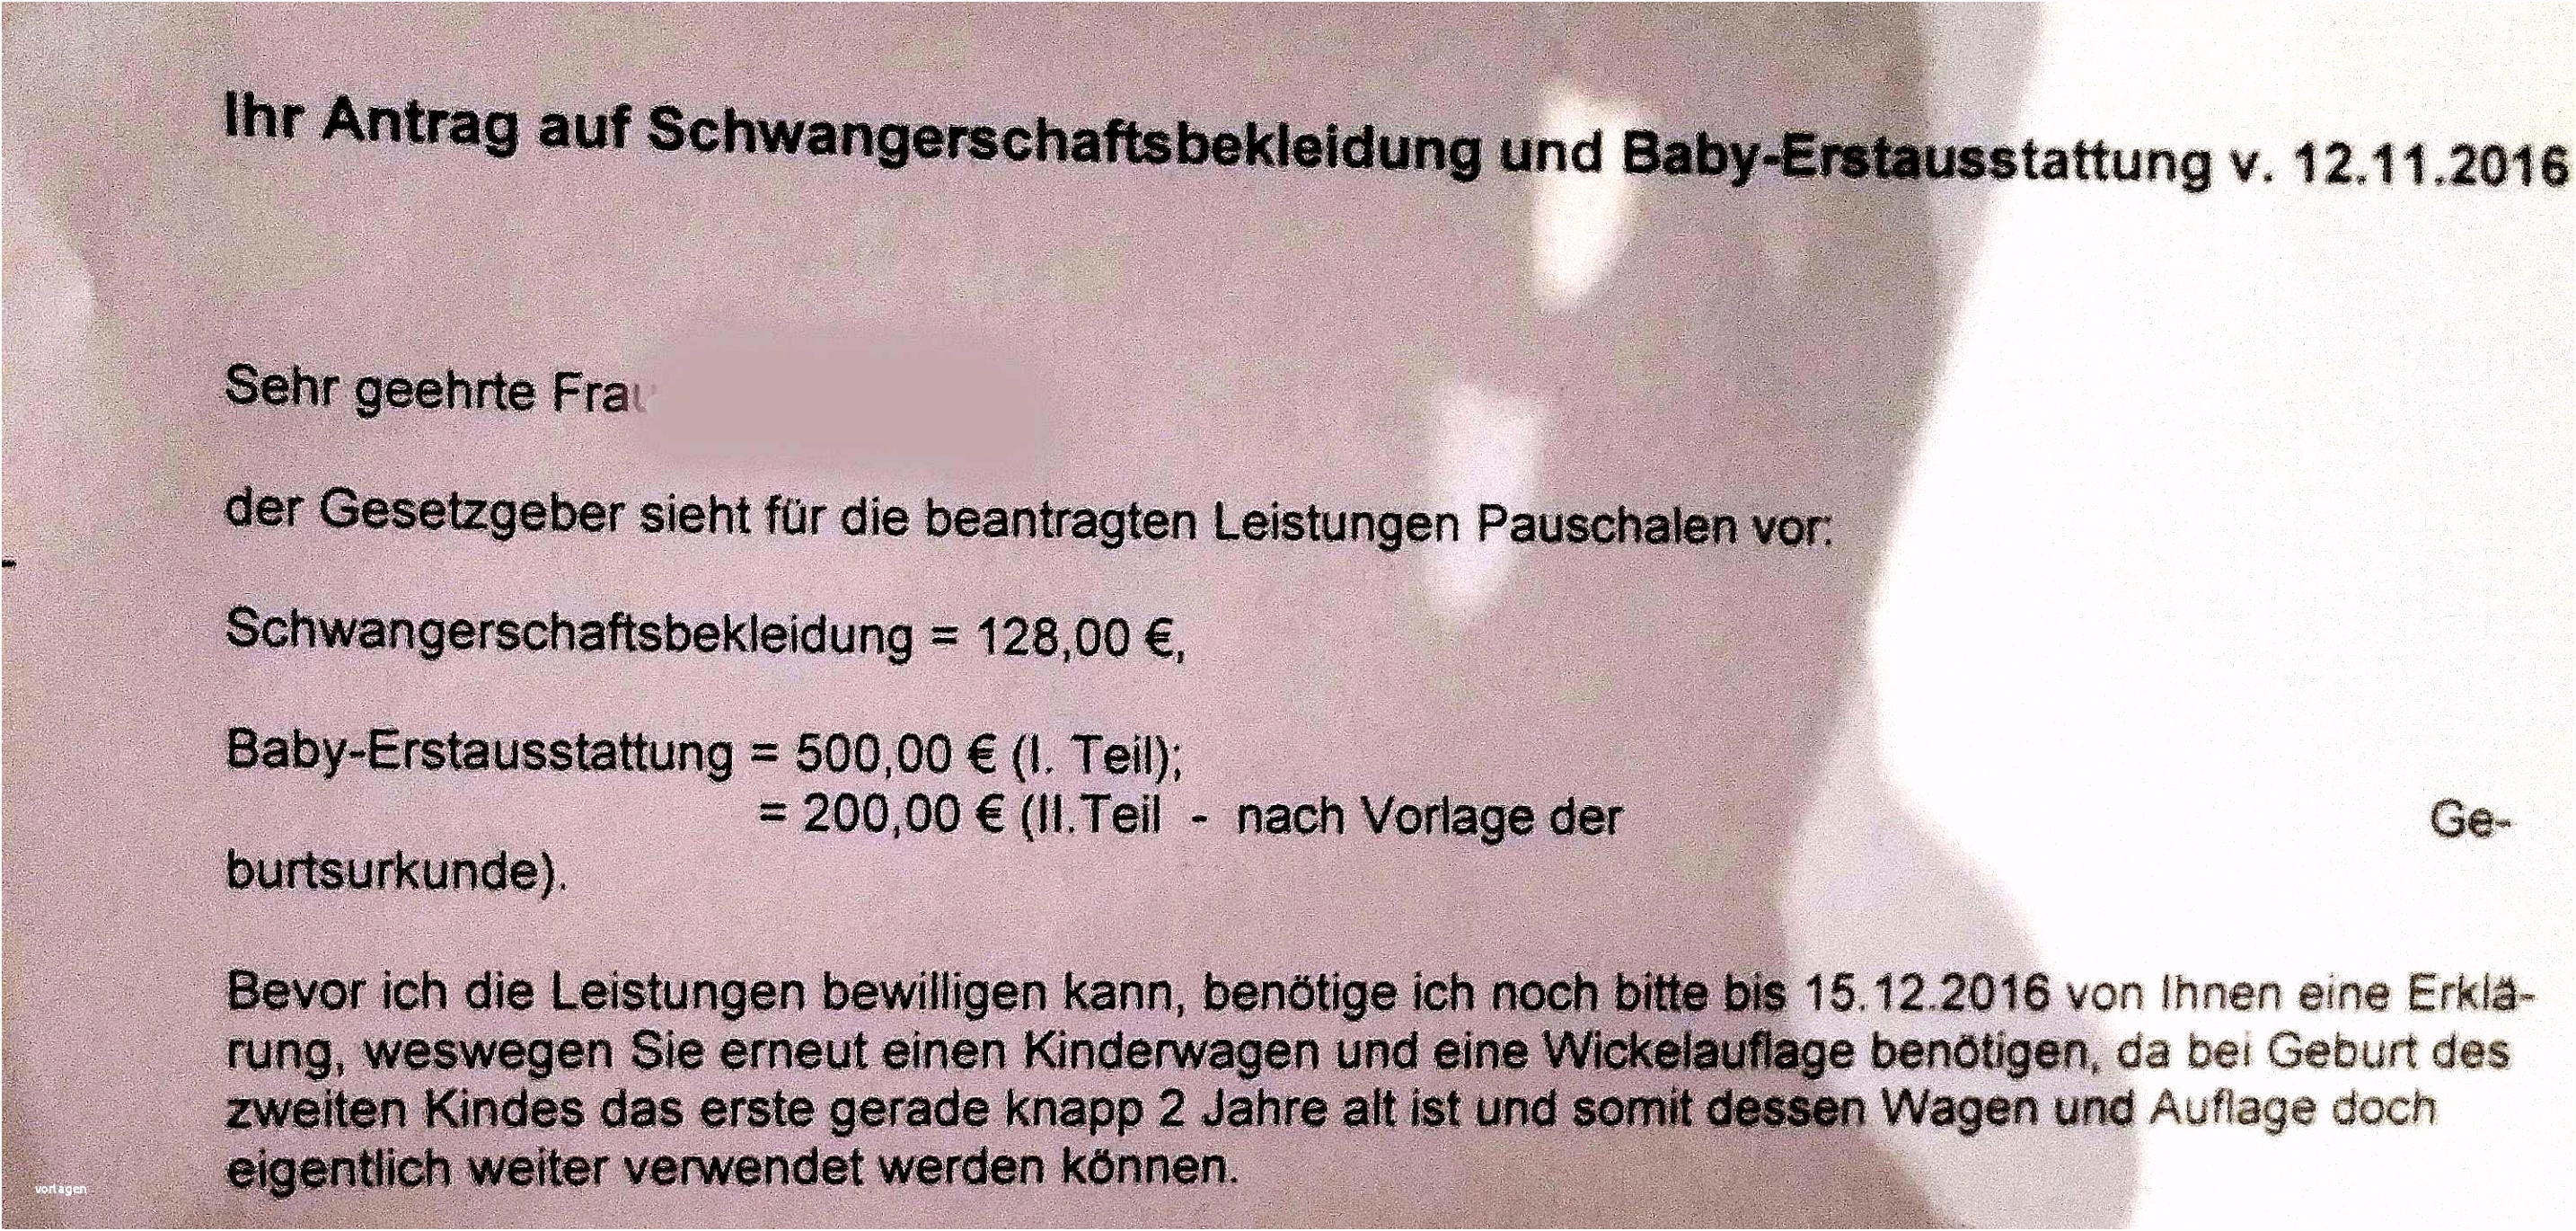 Antrag Erstausstattung Baby Jobcenter Vorlage Erstausstattung Baby A4dr34thv5 X0hcm4tfxu